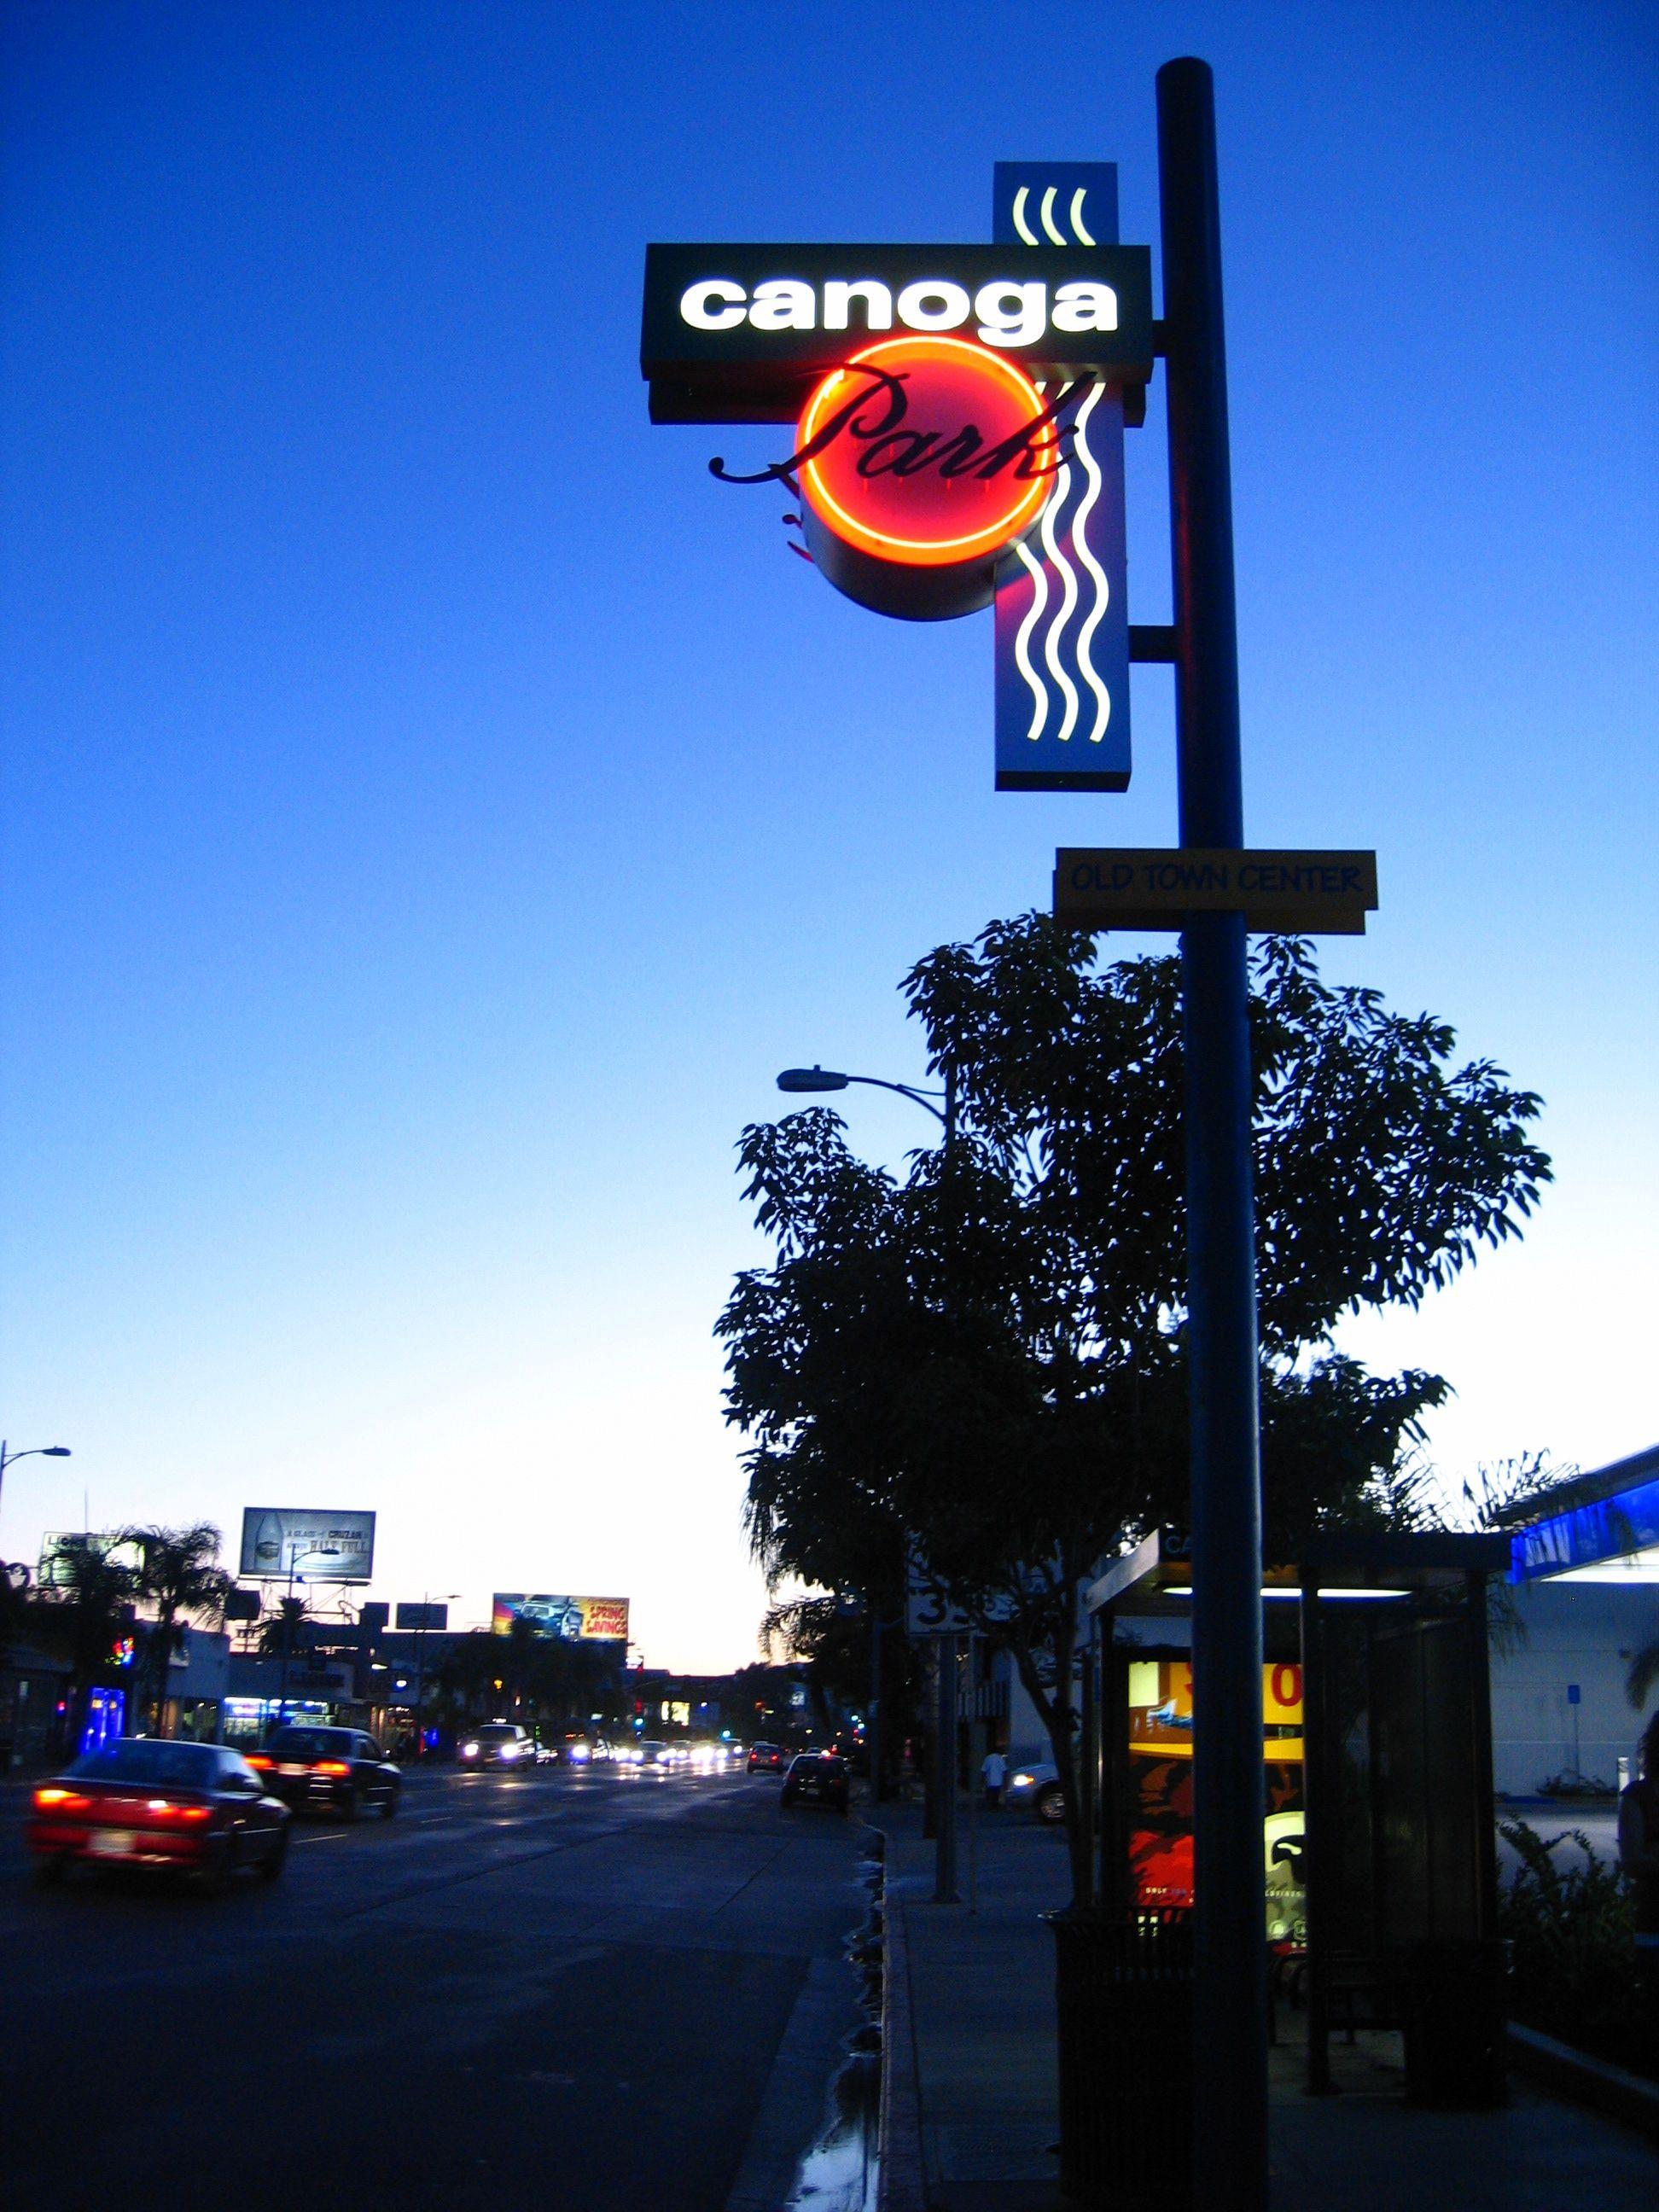 Canoga Park, California Canoga park, Canoga, Heating repair